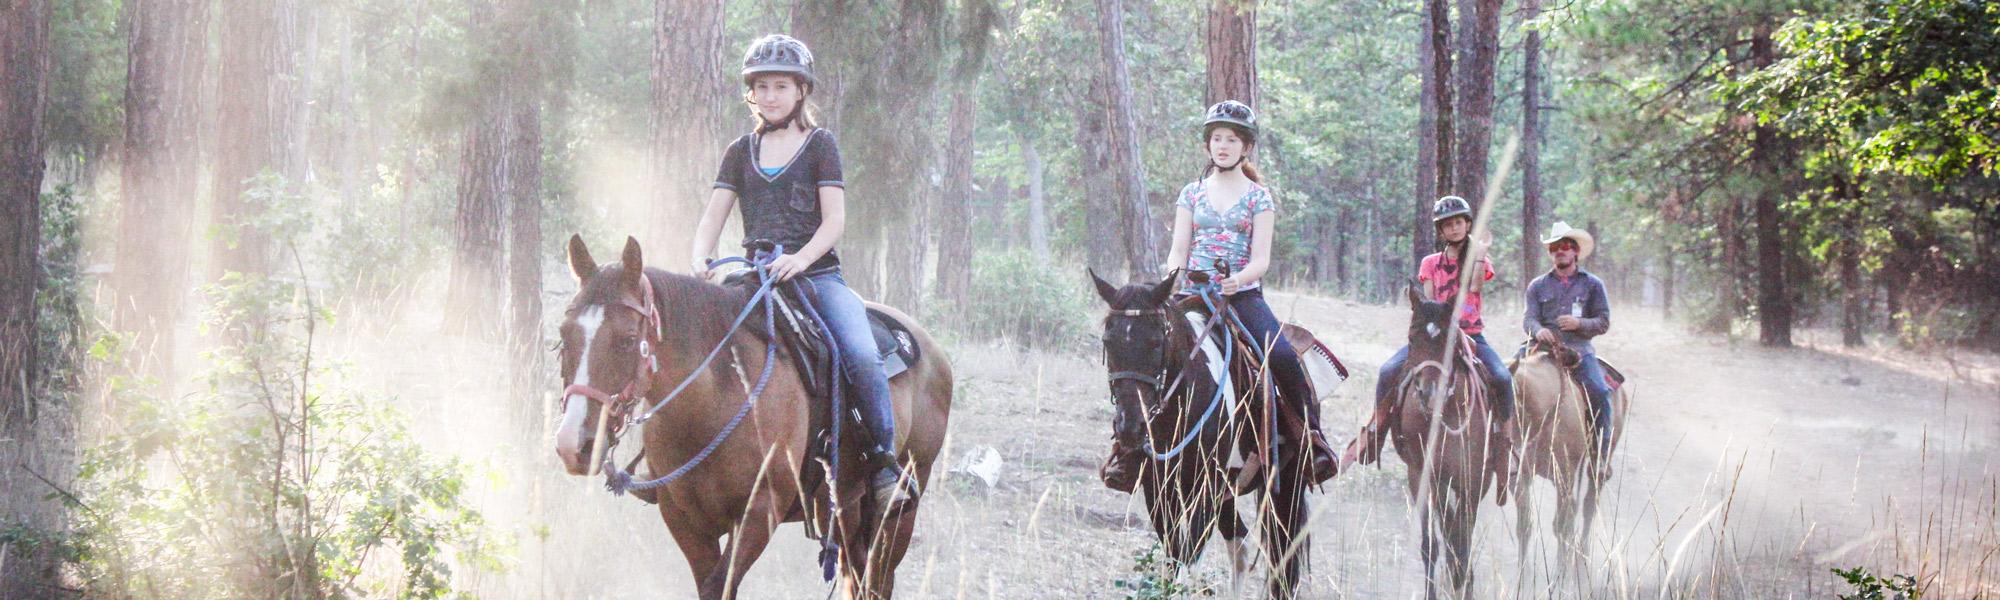 Kidder Creek Horseback Riding